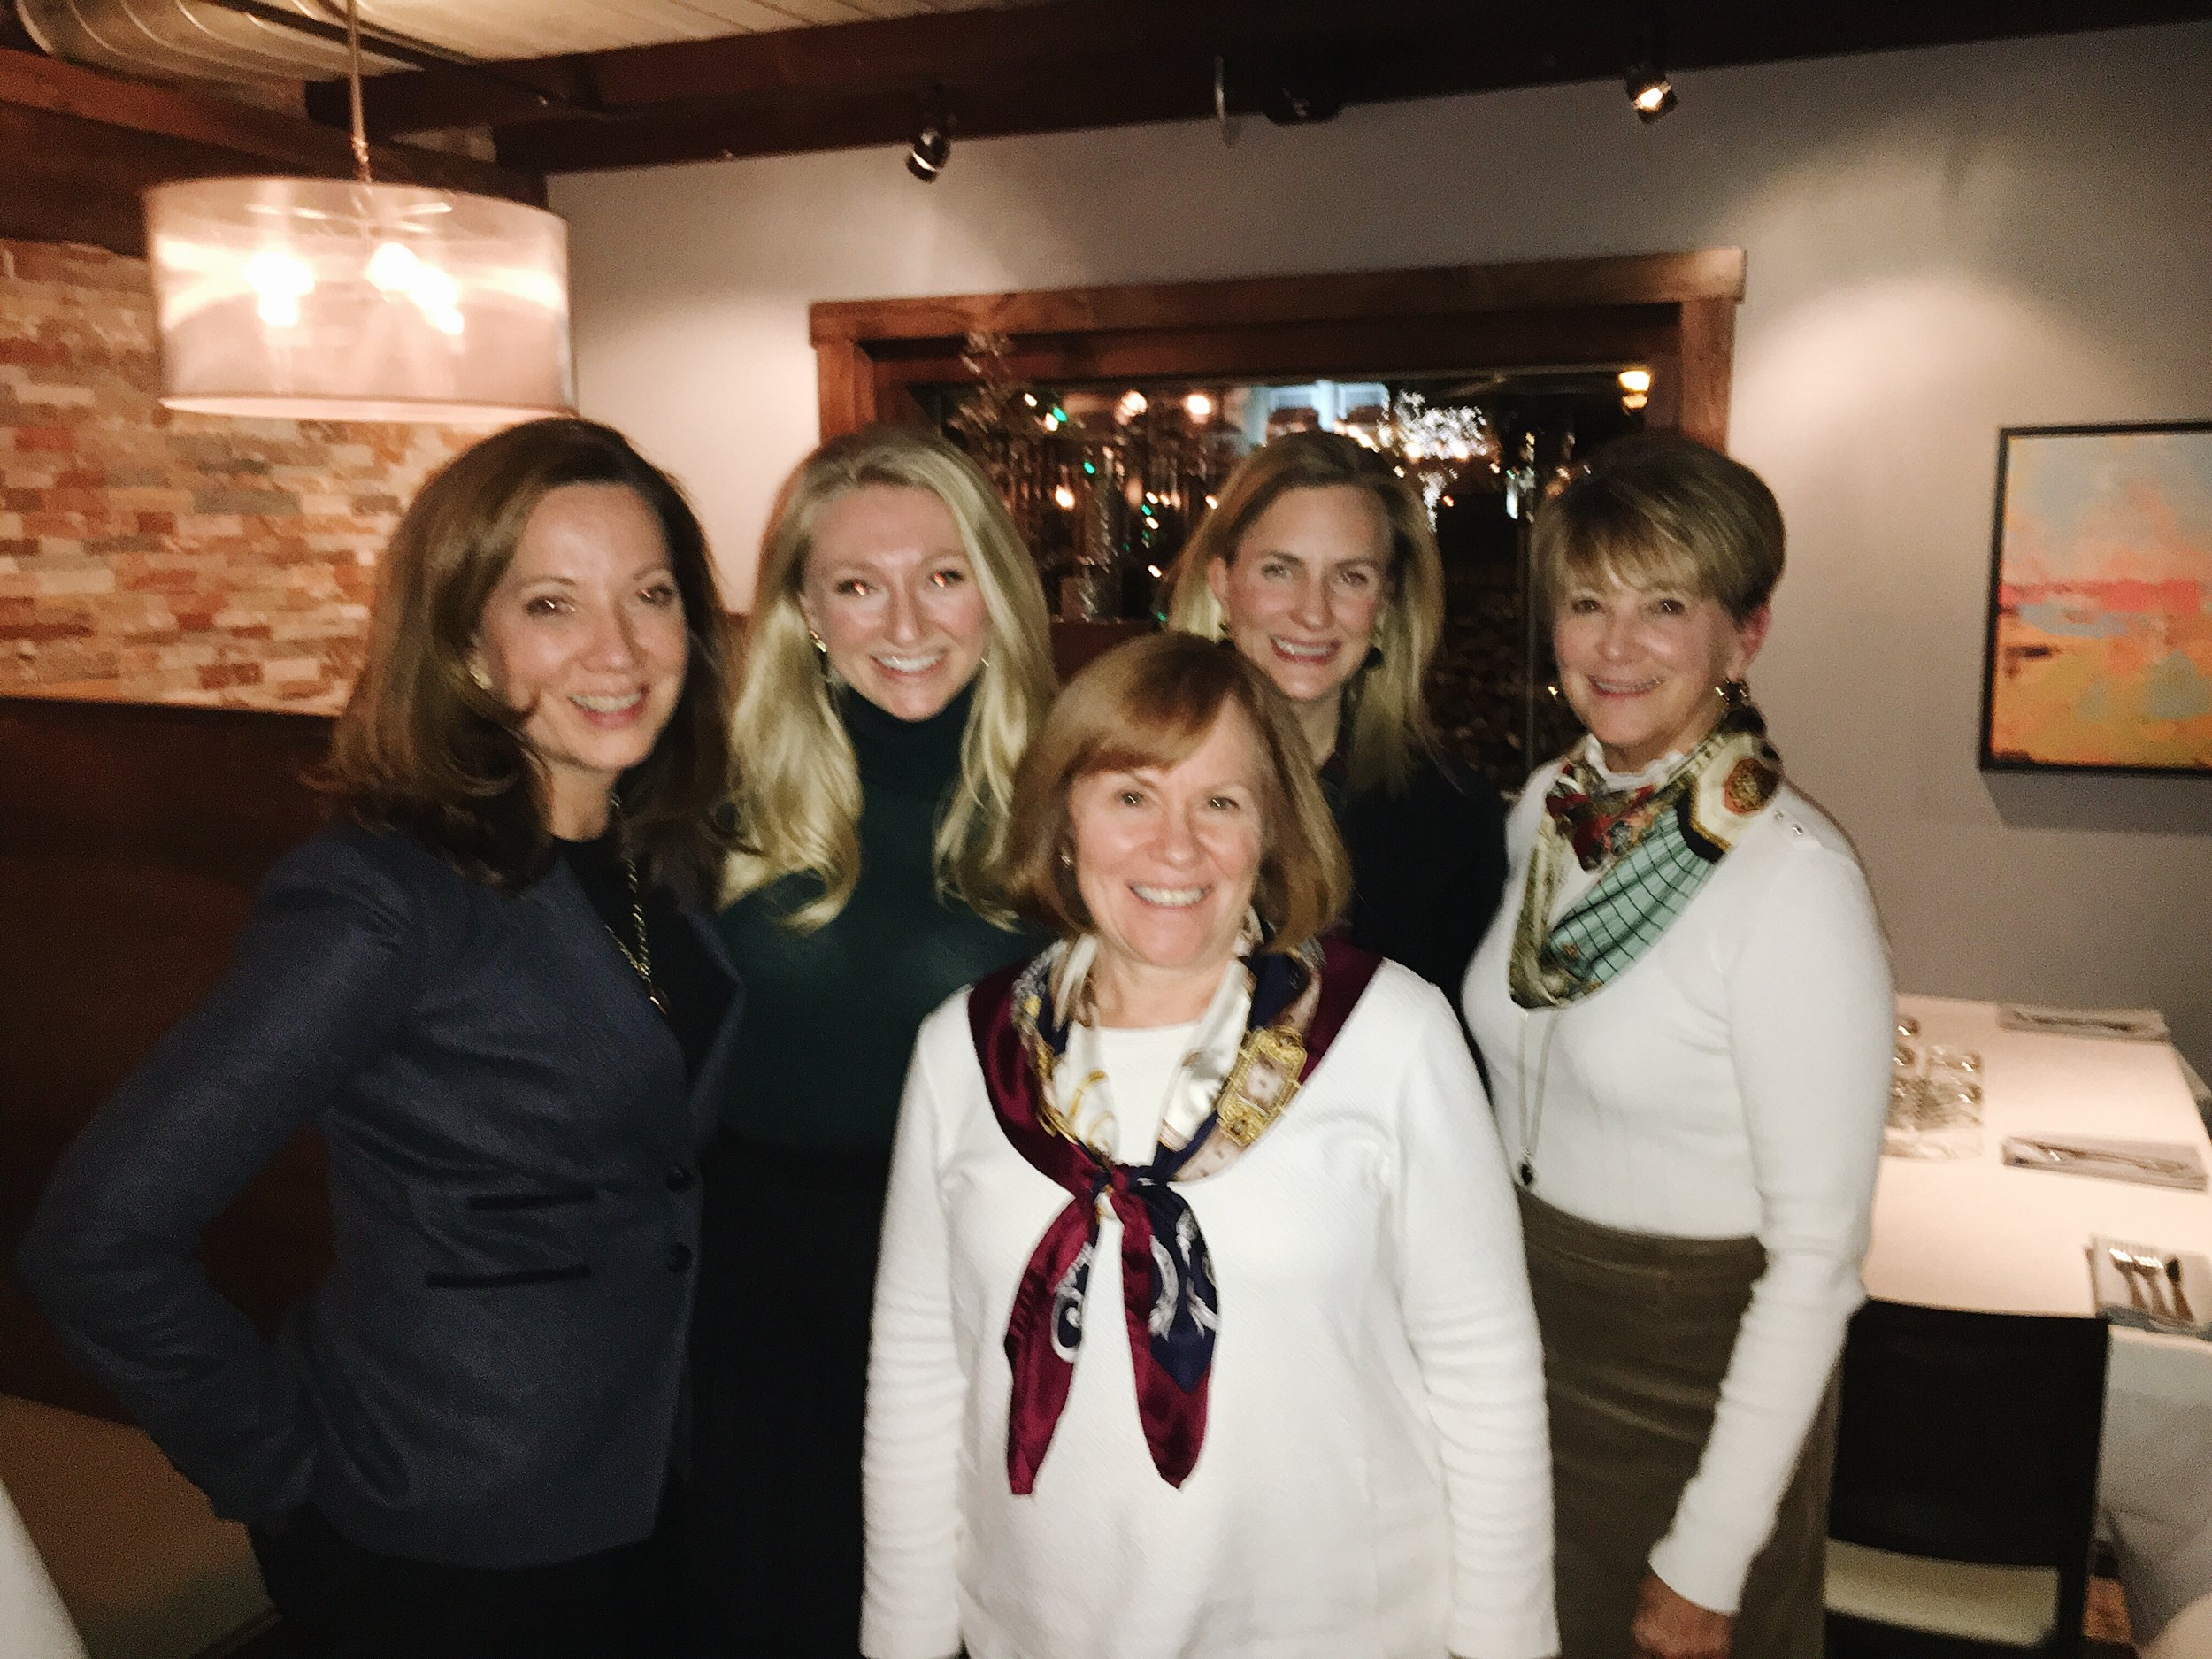 The Jeannie Balsam Interiors team on our Geneva getaway!